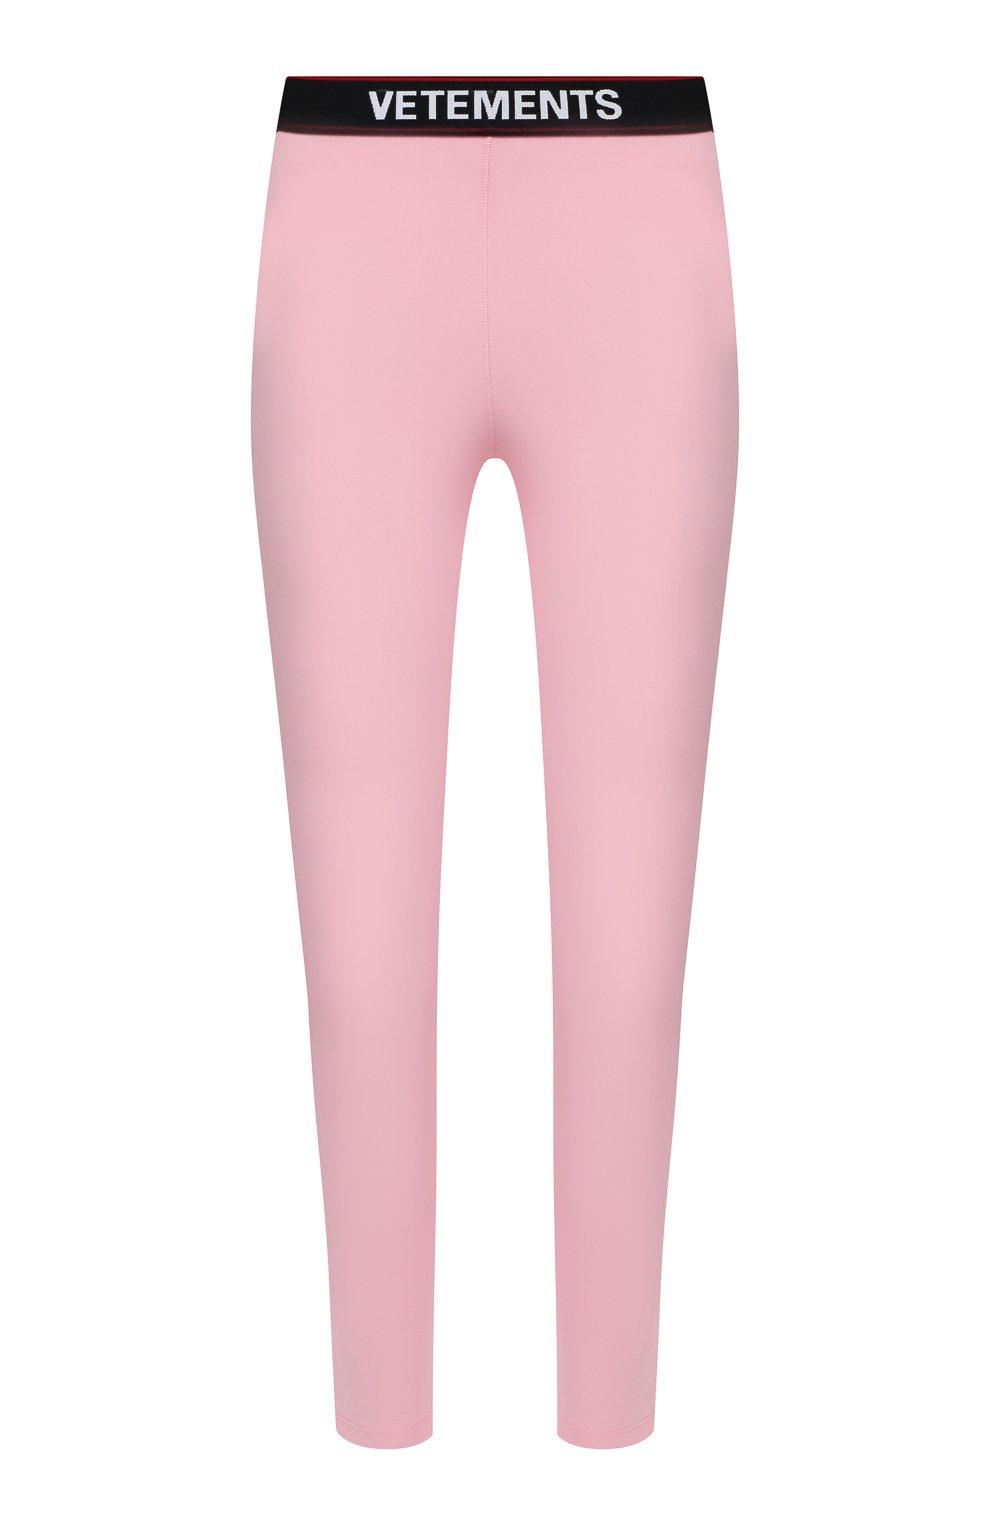 Женские леггинсы VETEMENTS розового цвета, арт. WE51PA640P 1332/BABY PINK | Фото 1